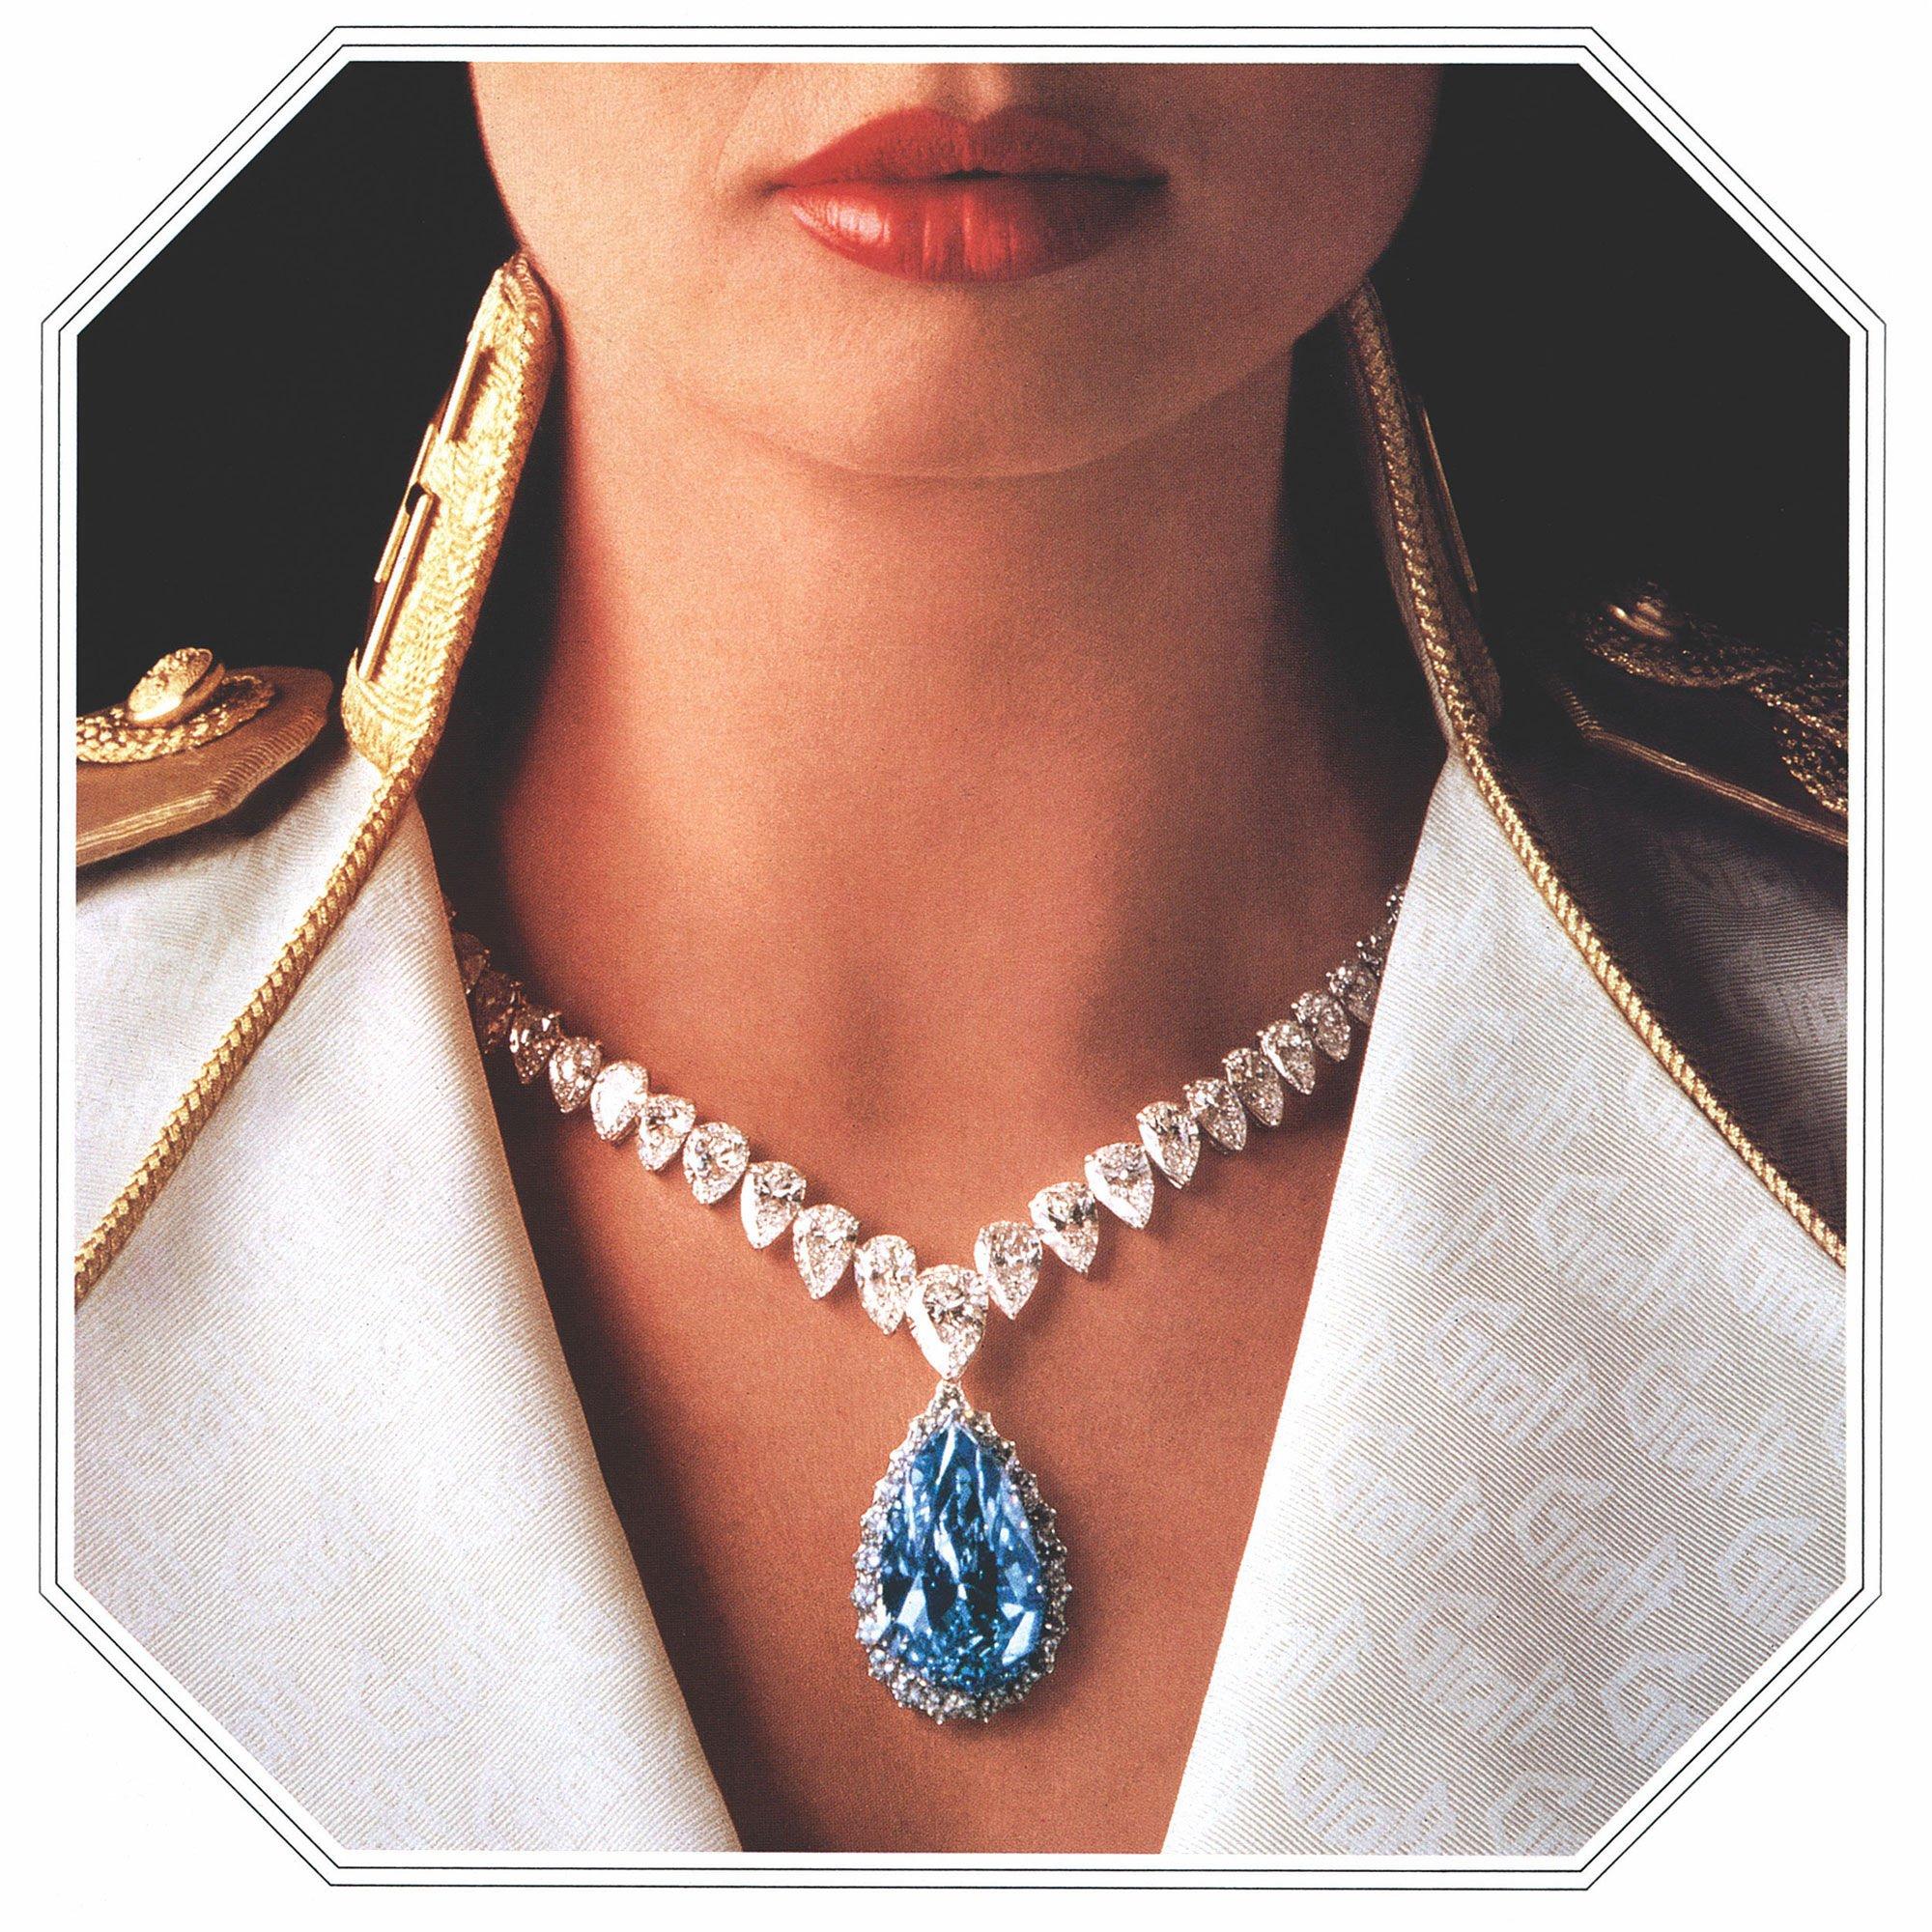 Model wearing a Graff high jewellery diamond necklace featuring pear shape blue diamond.